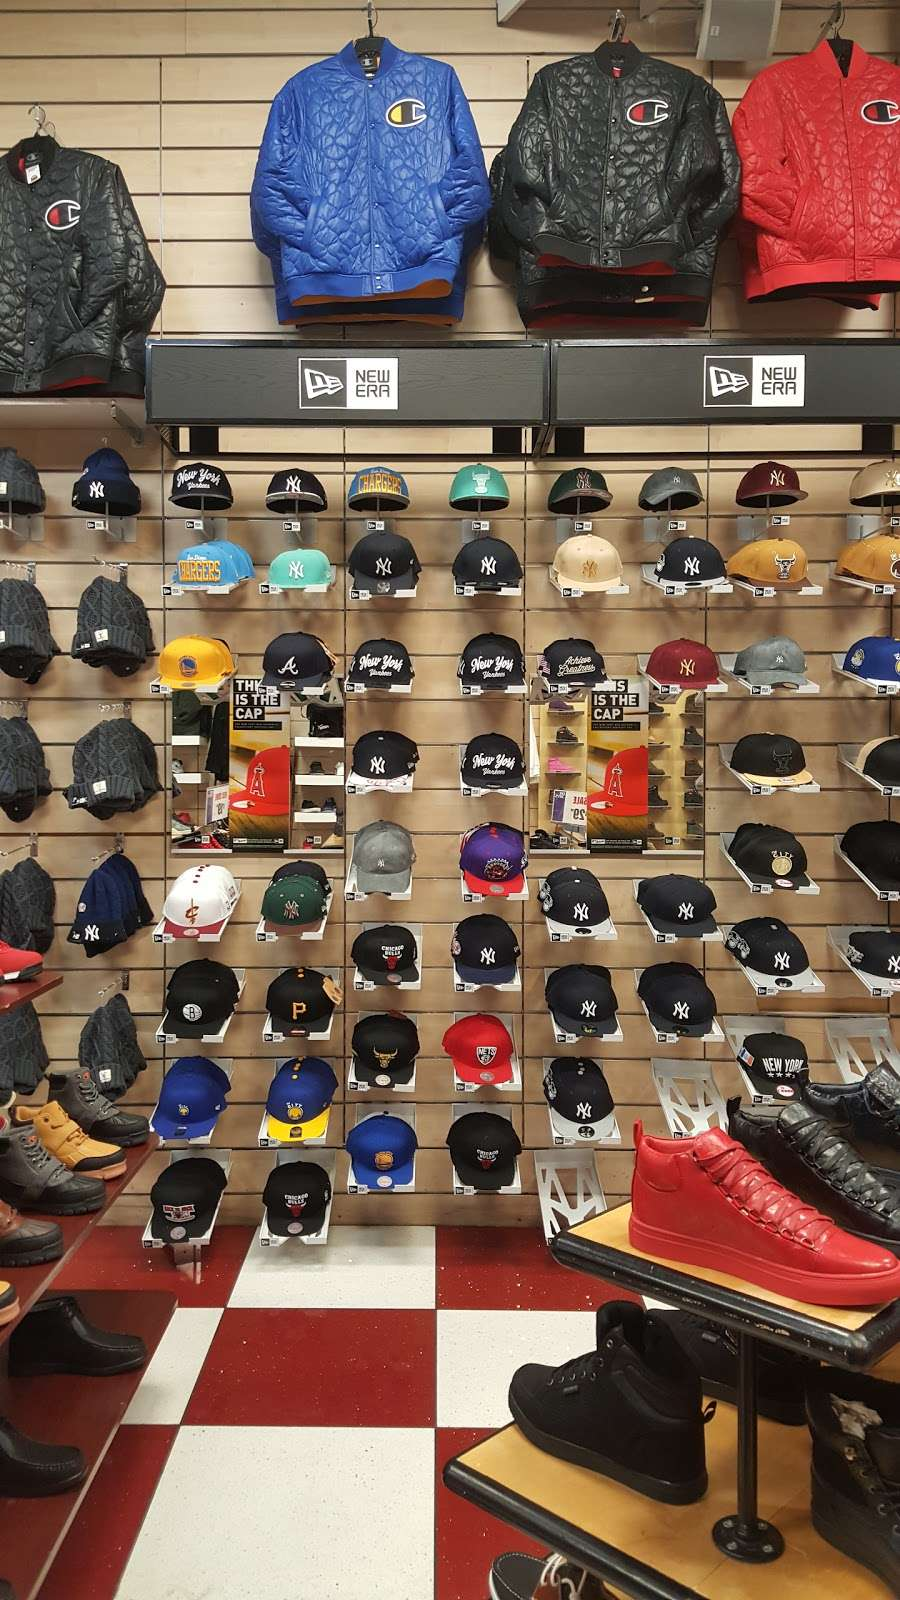 Dr Jays - clothing store  | Photo 5 of 10 | Address: 215 E Fordham Rd, The Bronx, NY 10458, USA | Phone: (718) 220-3354